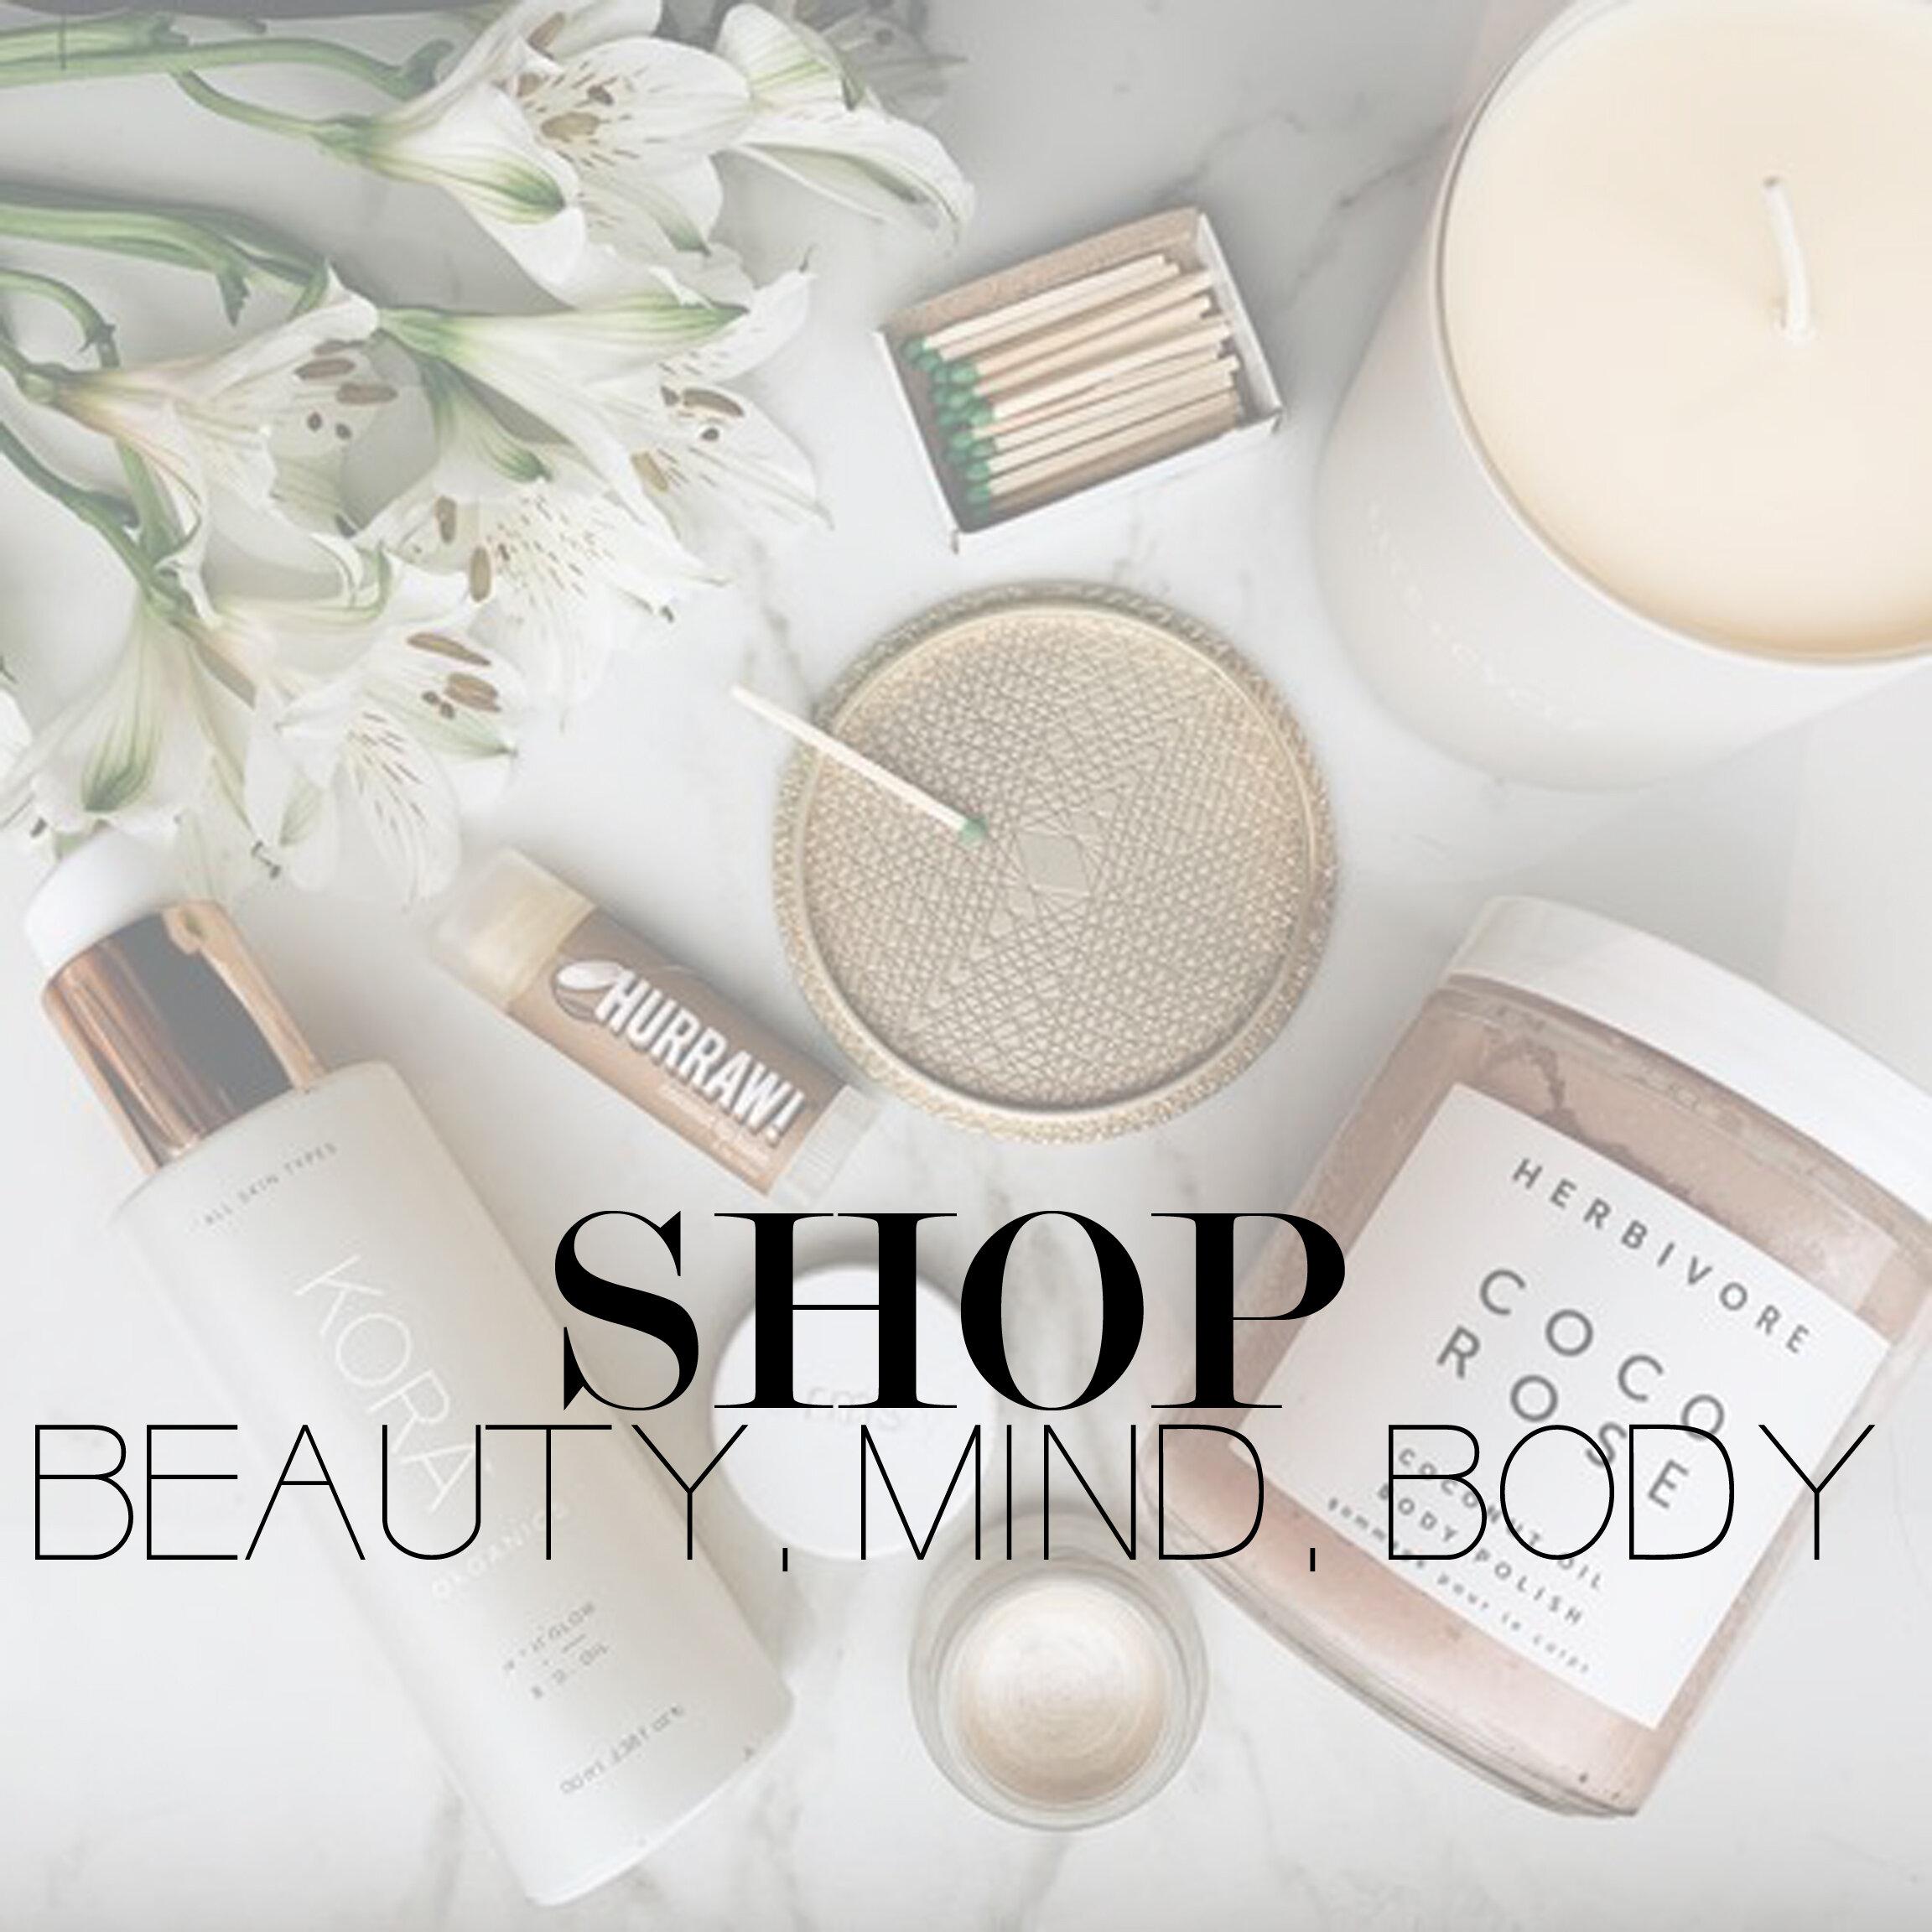 shop beauty mind body.jpg